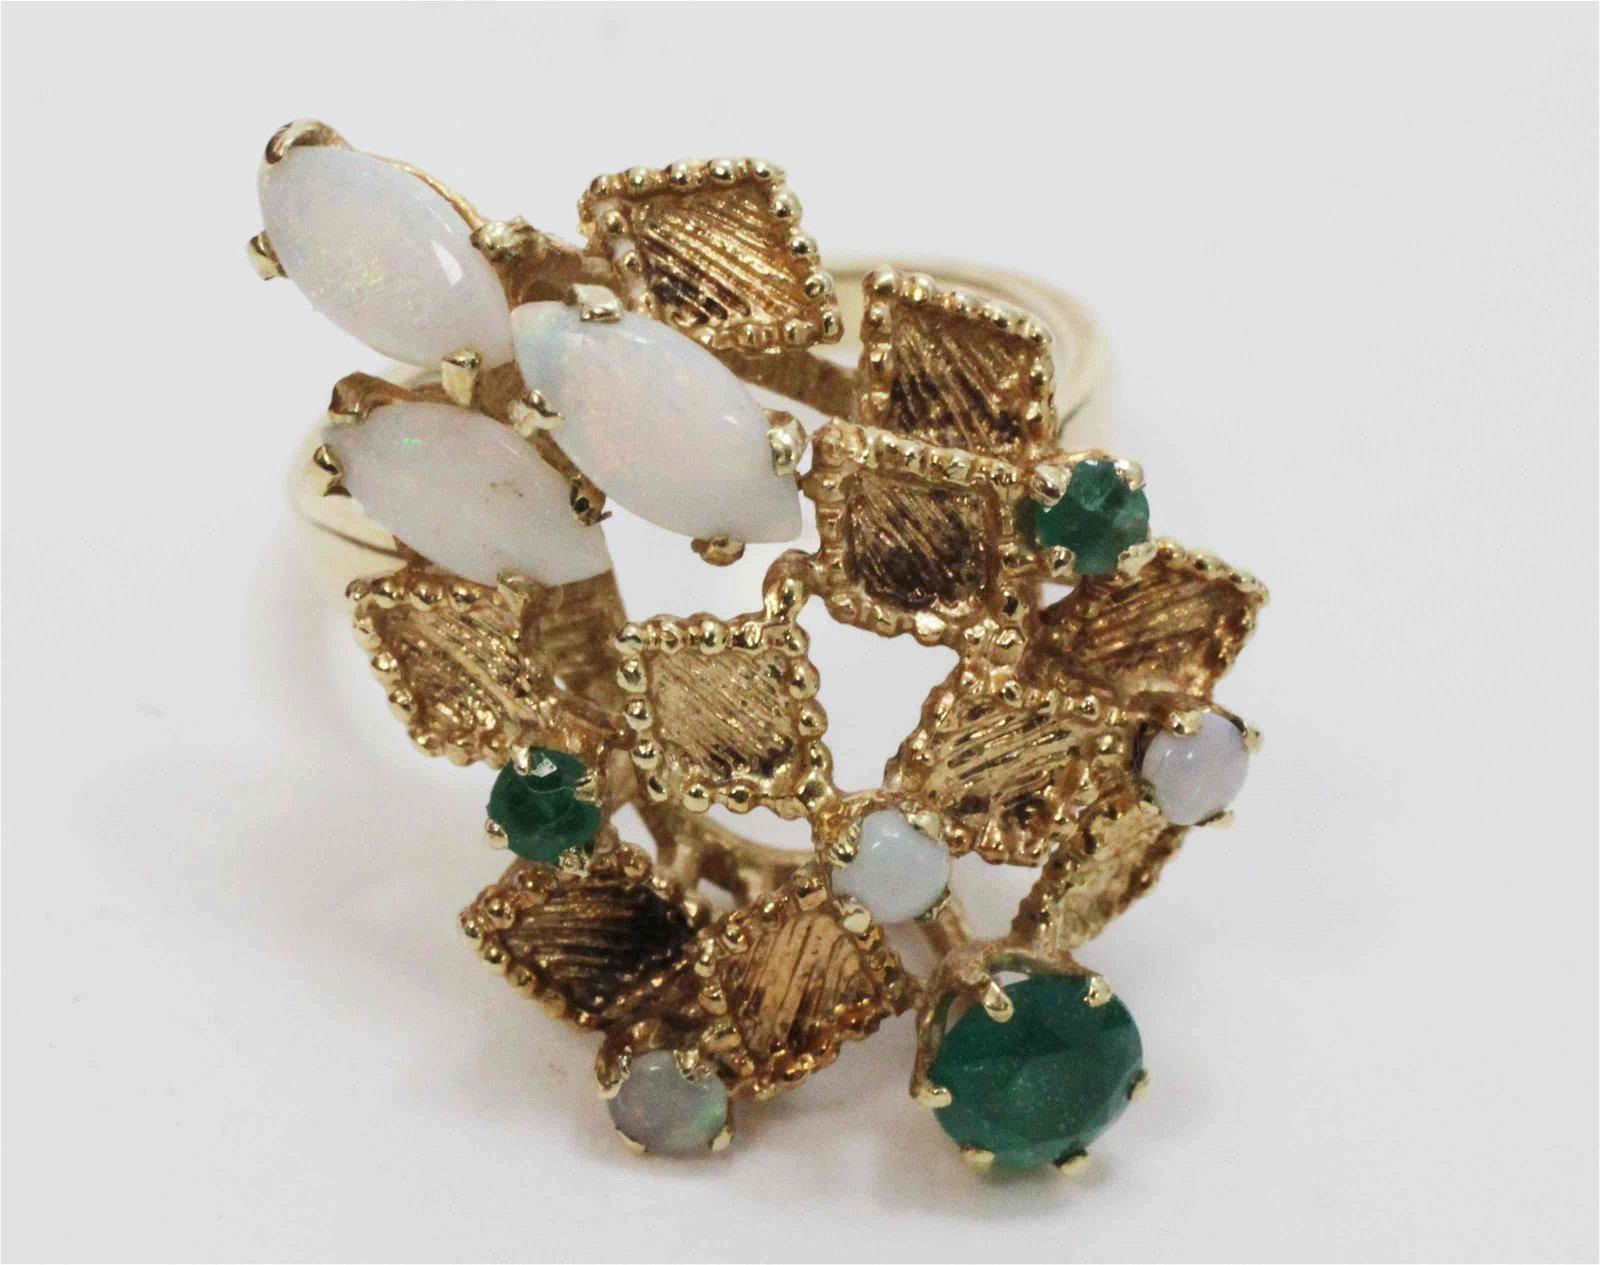 70s 14k Gold Harlequin Ring Set w Opals & Emeralds